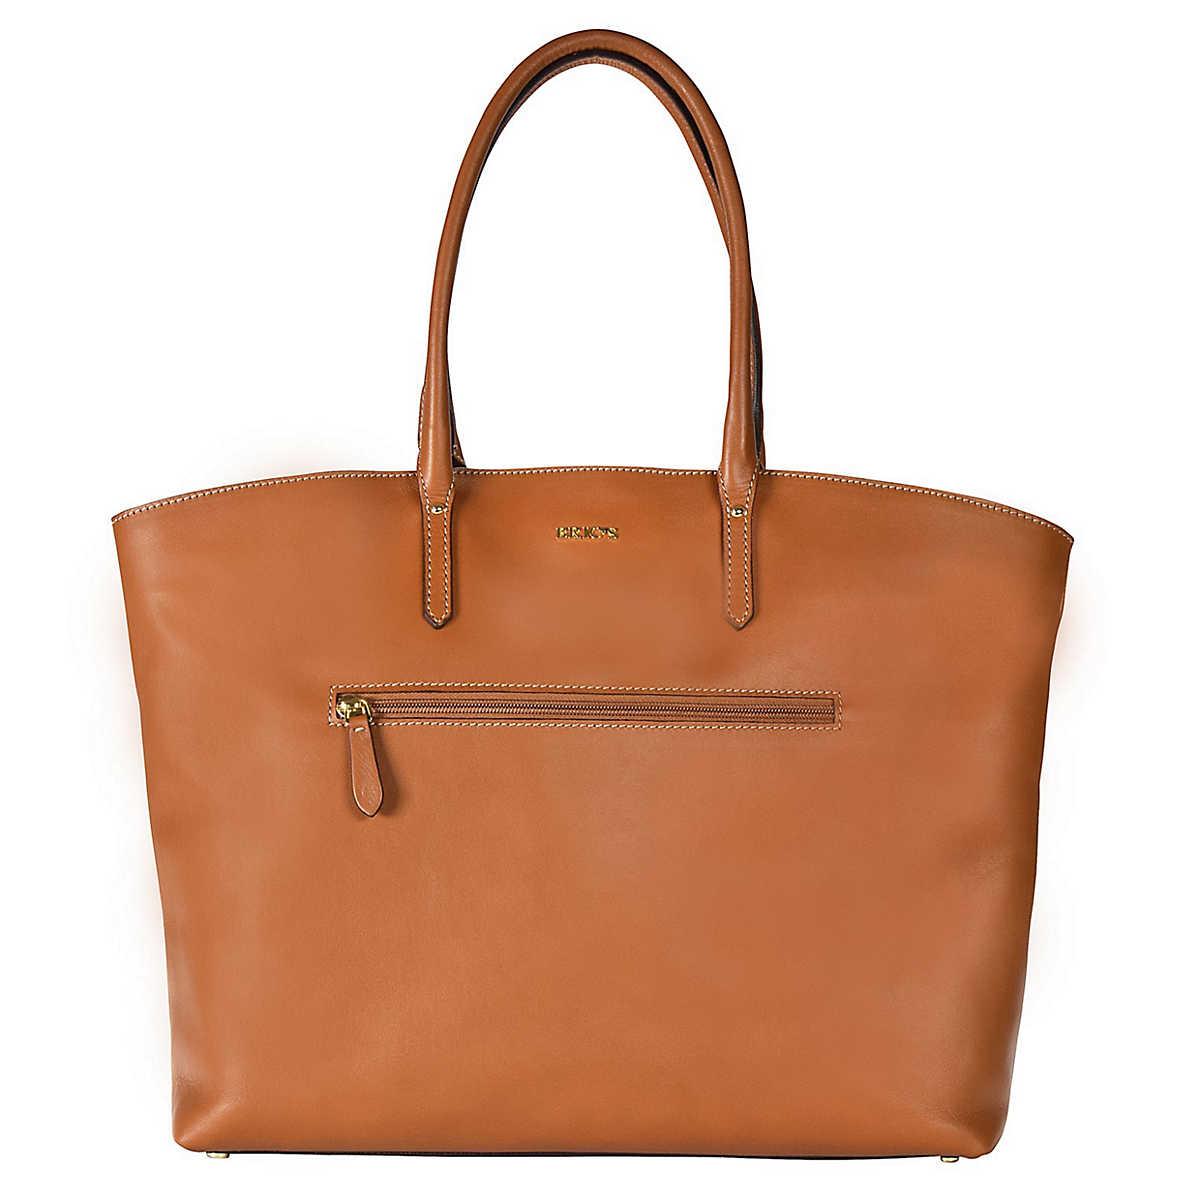 Bric�´s Life Pelle Shopper Tasche Leder 29 cm braun - Bric�´s - Shopper - Taschen - mirapodo.de